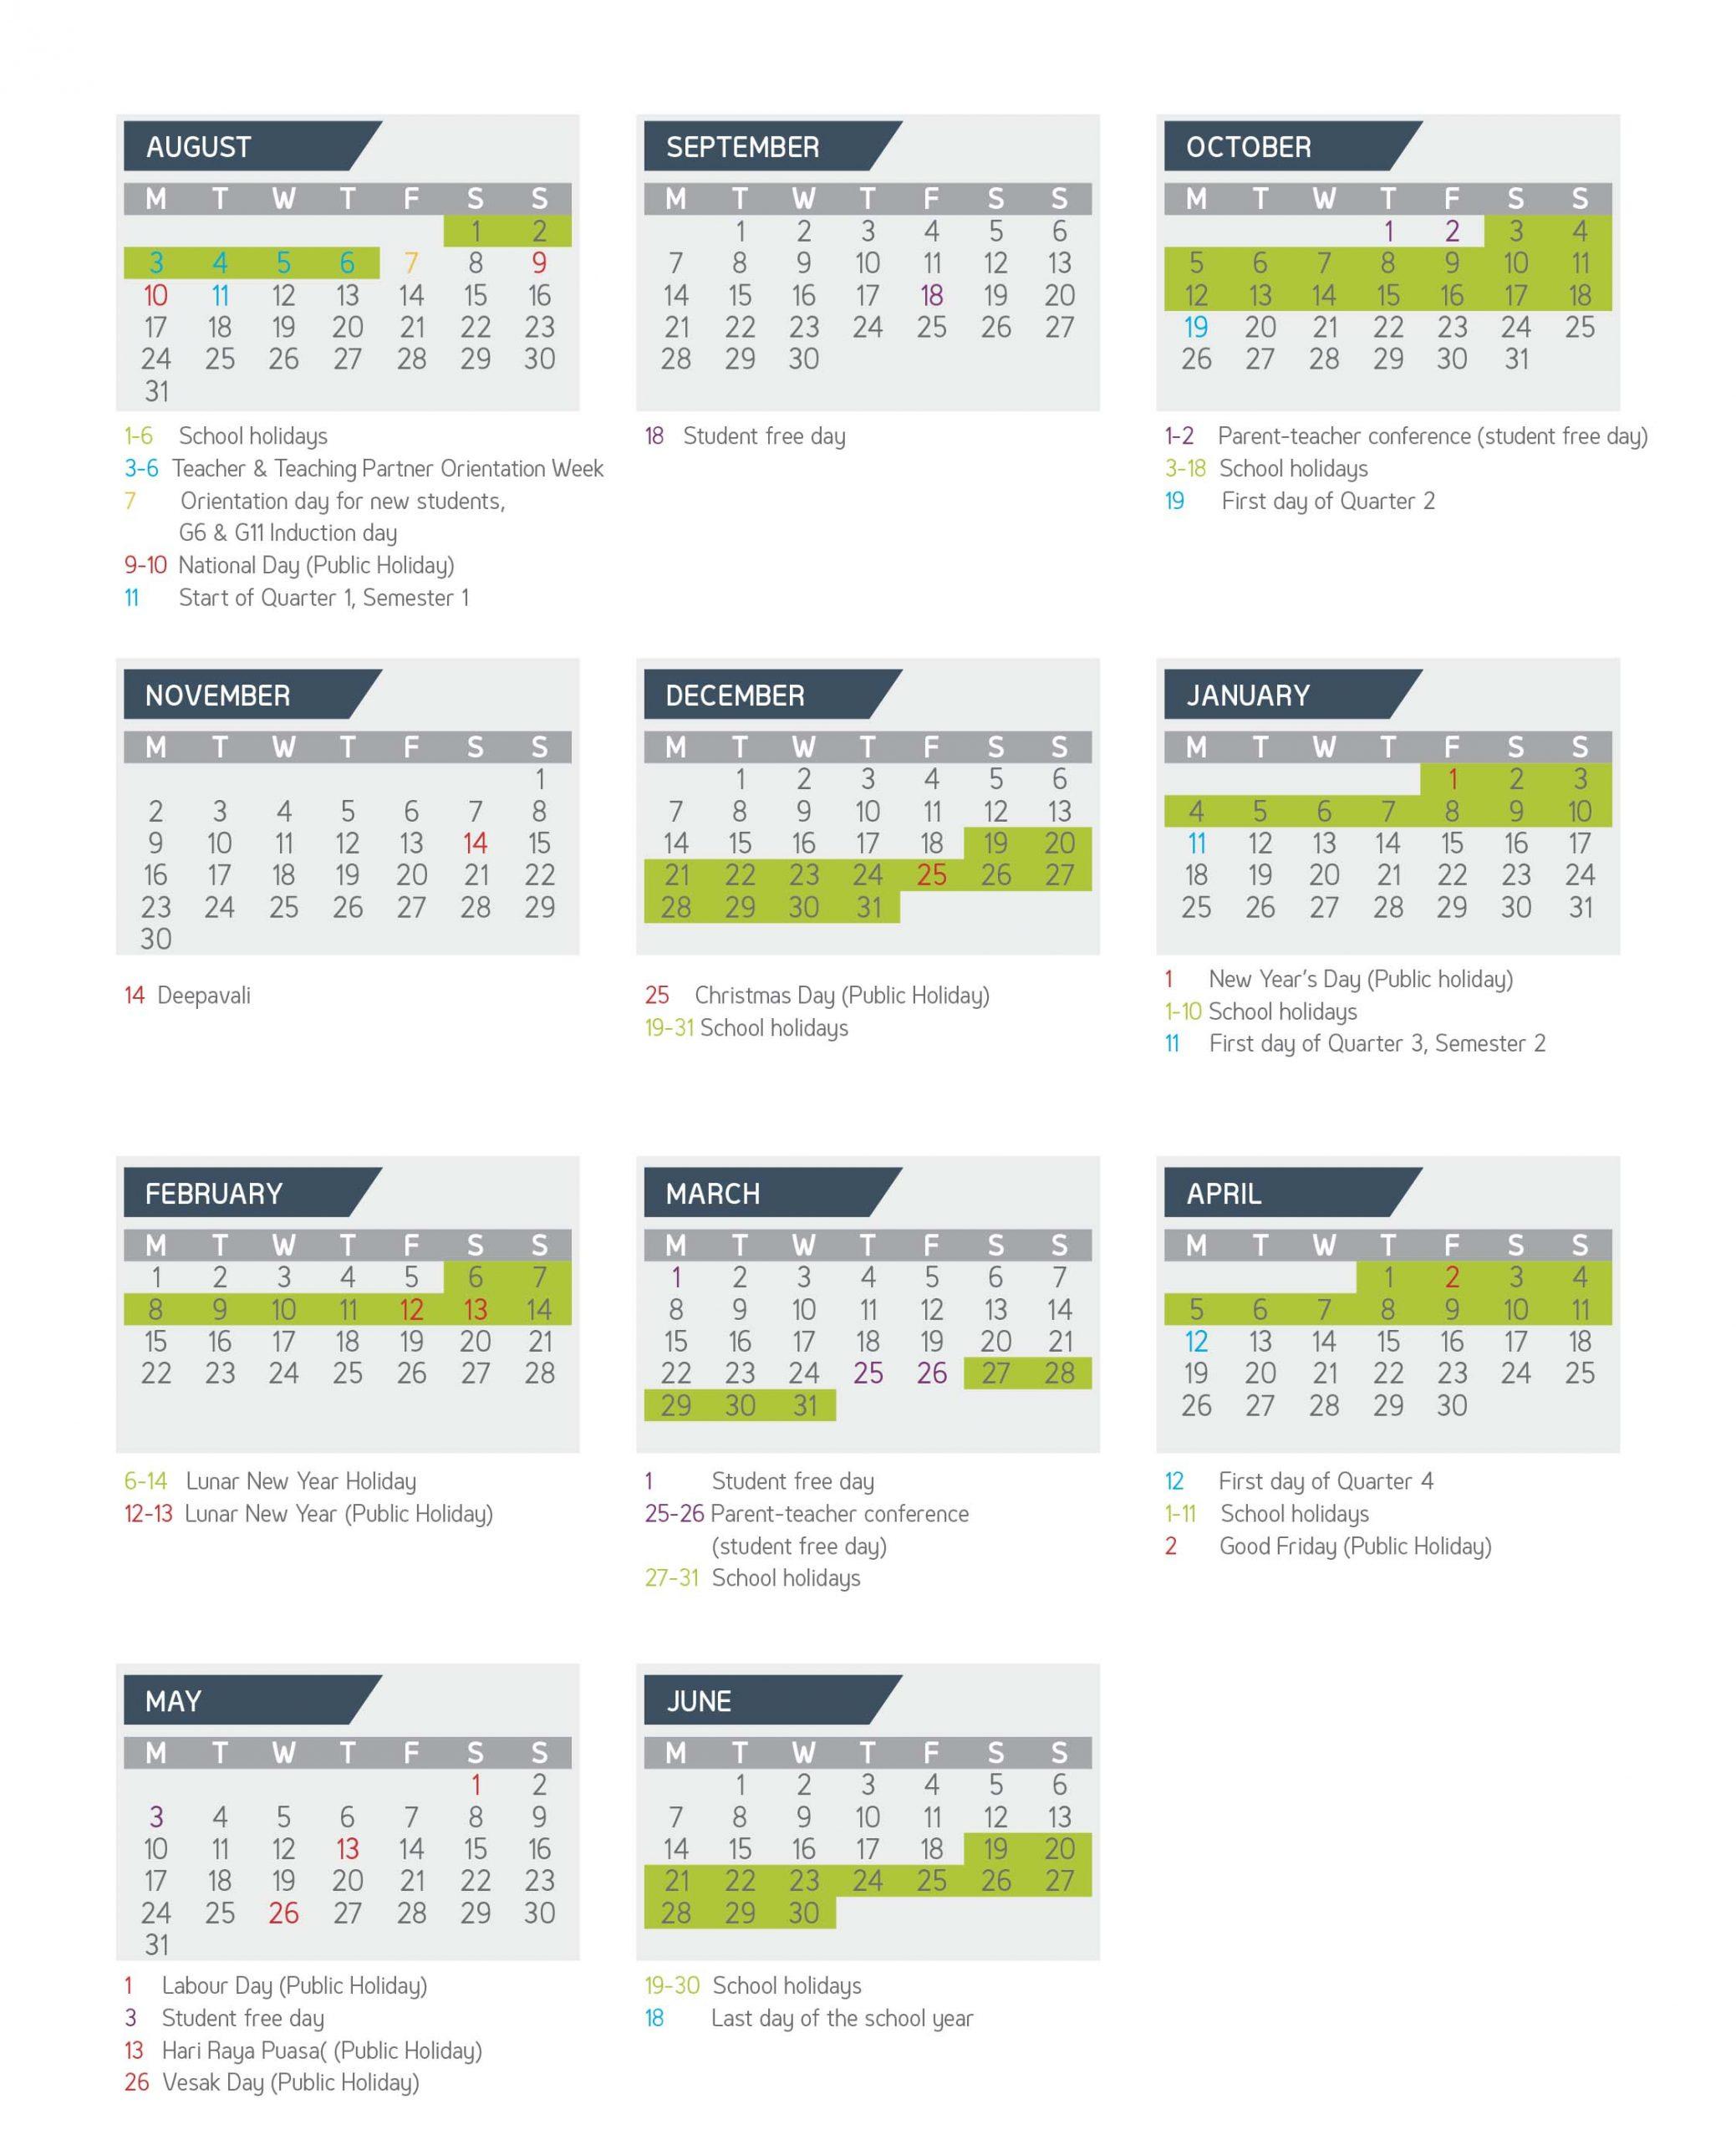 Academy 1 Jersey City Public School Calendar | Printable With Las Cruces Public School Calendar 2021